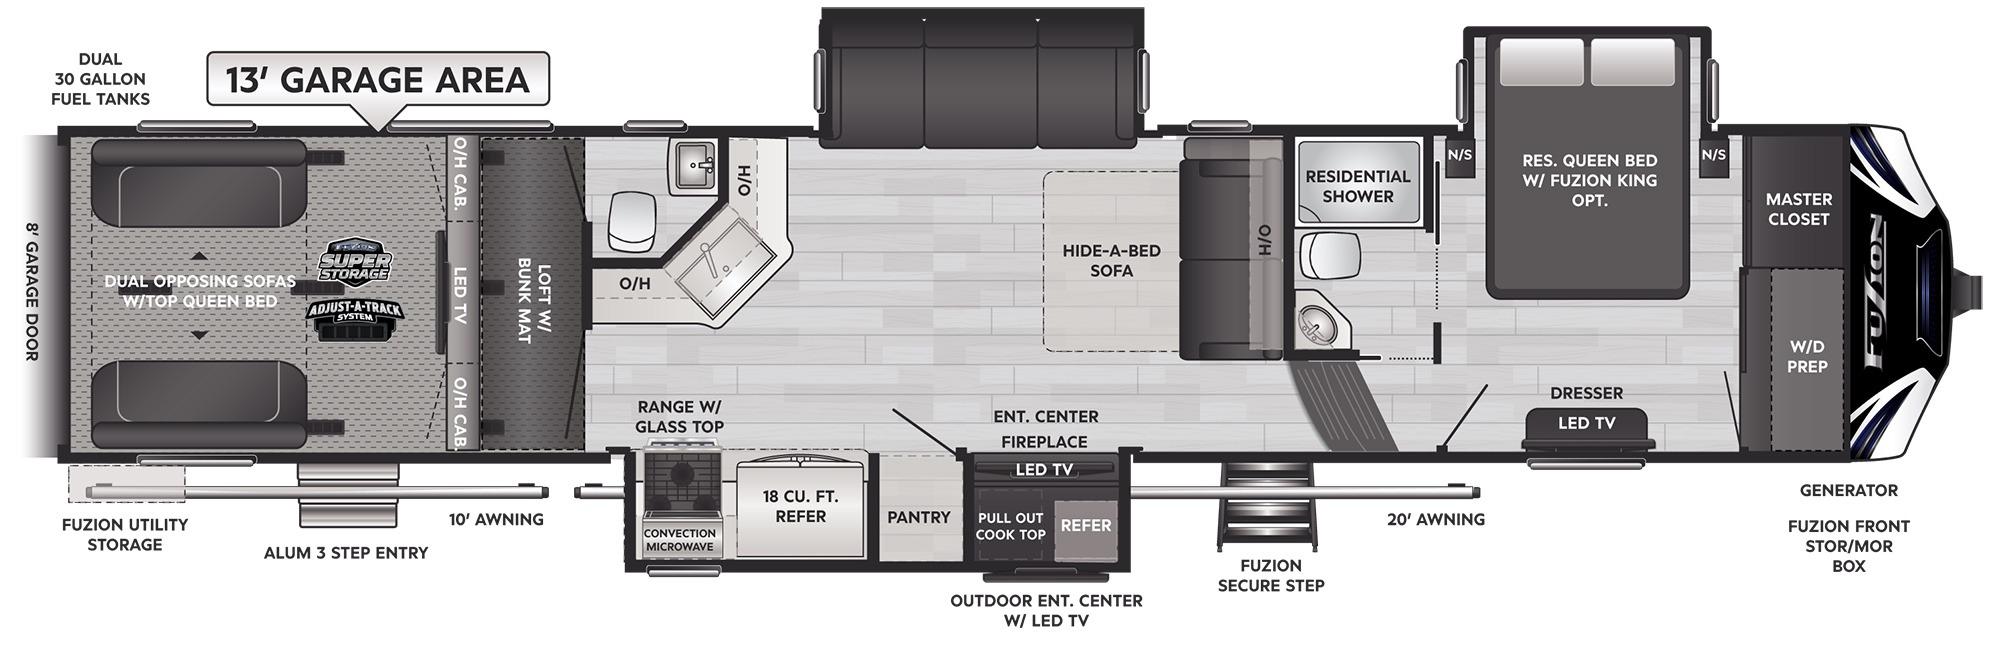 View Floor Plan for 2022 KEYSTONE FUZION 428